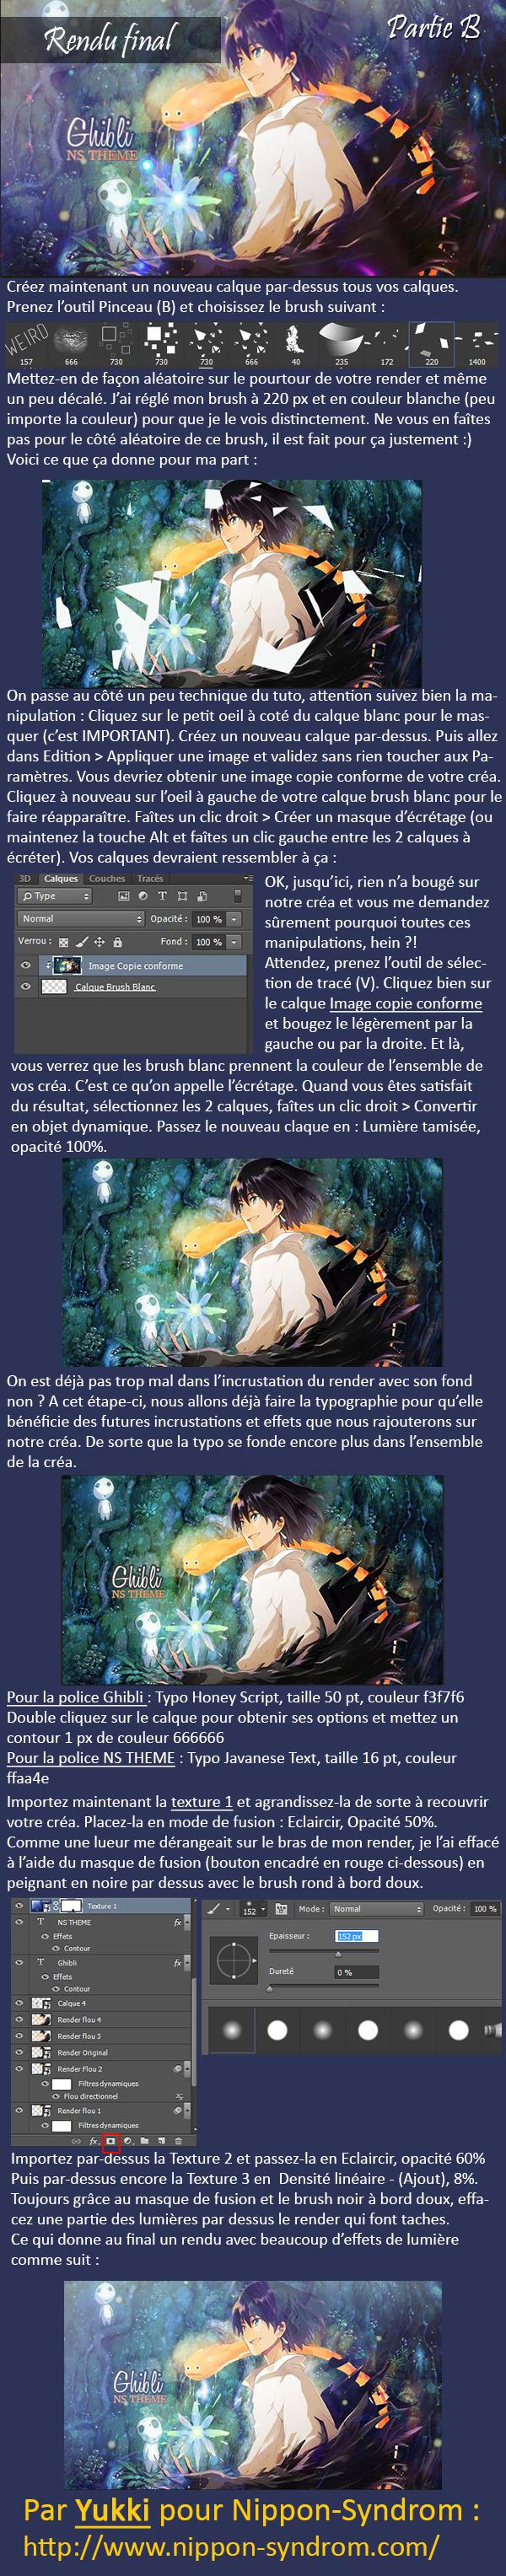 [Photoshop-Intermédiaire] Signature Ghibli 16010307594616662013872108